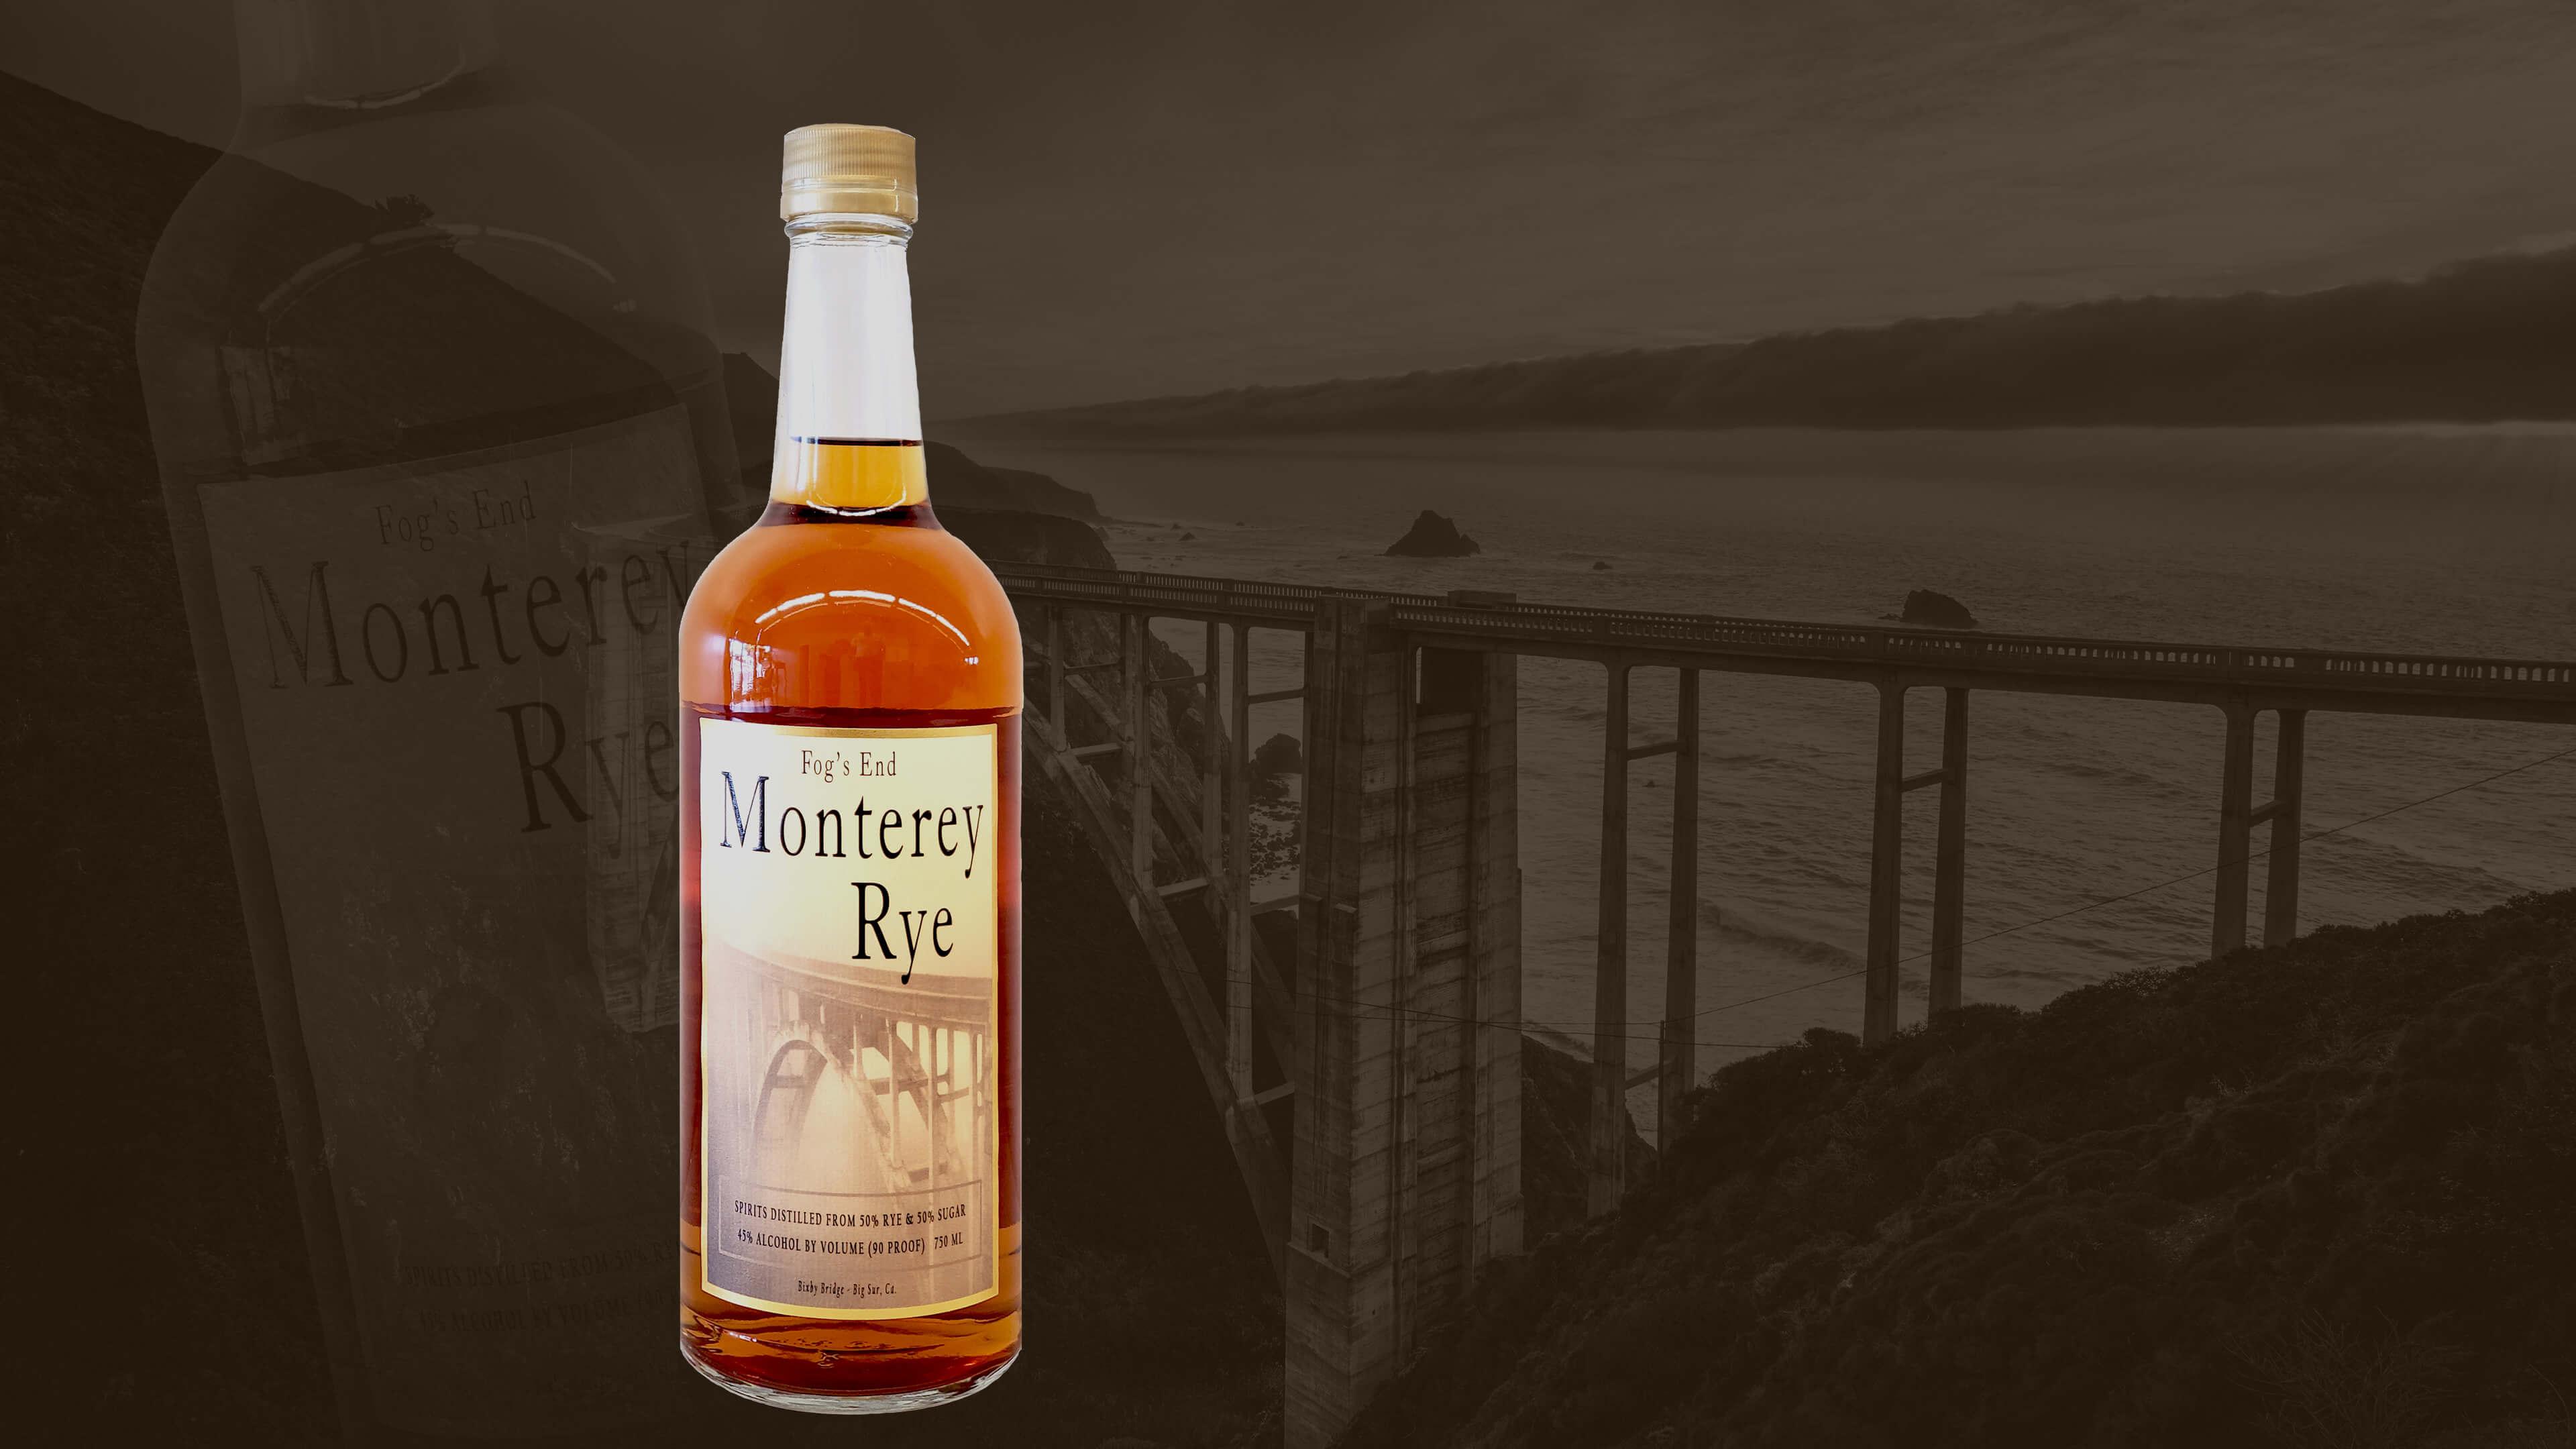 Monterey Rye with Bixby Bridge in the background